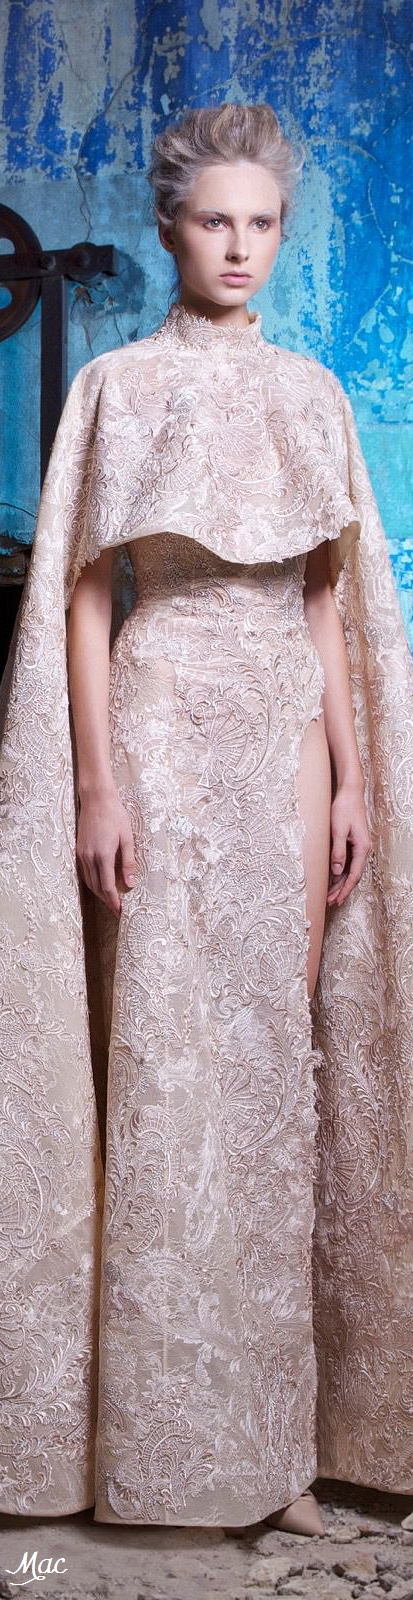 Fall 2016-2017 Haute Couture - Saiid Kobeisy. Jaglady